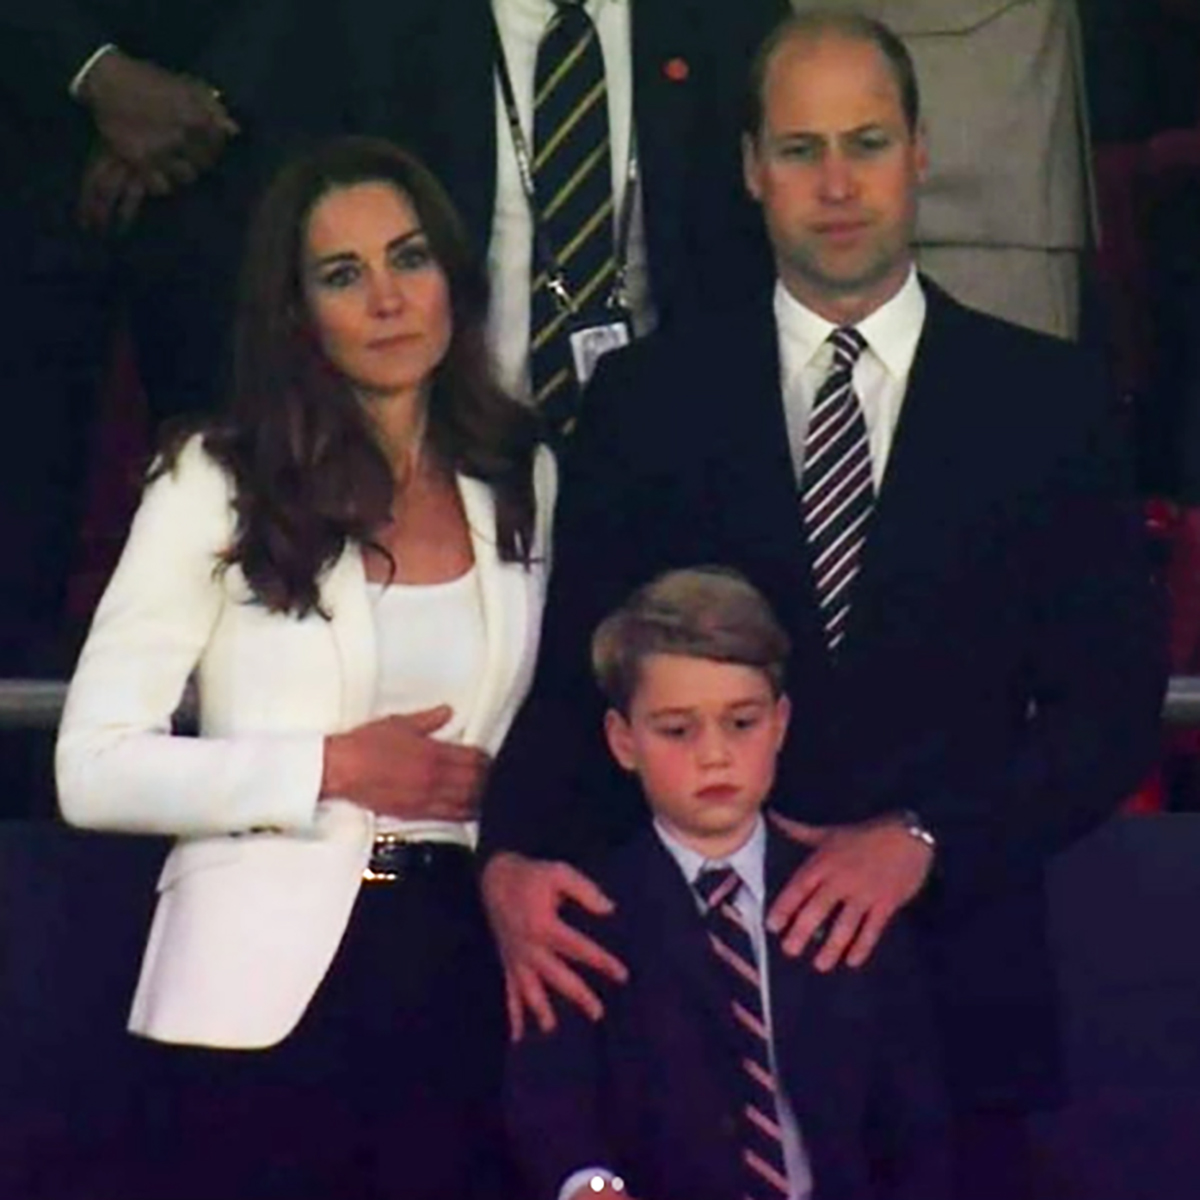 Principe George Furia William Kate Middleton Cartone Animato Satirico